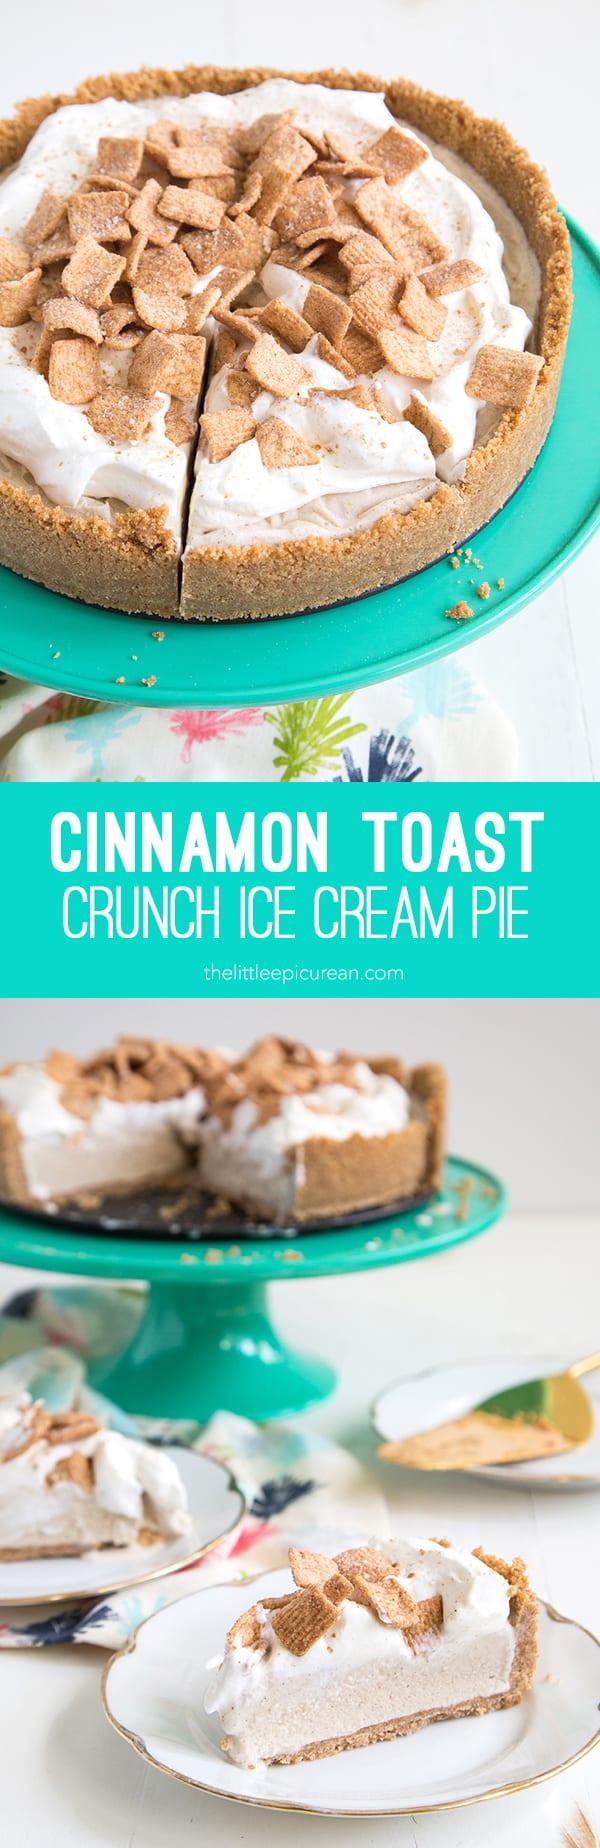 Cinnamon Toast Crunch Ice Cream Pie